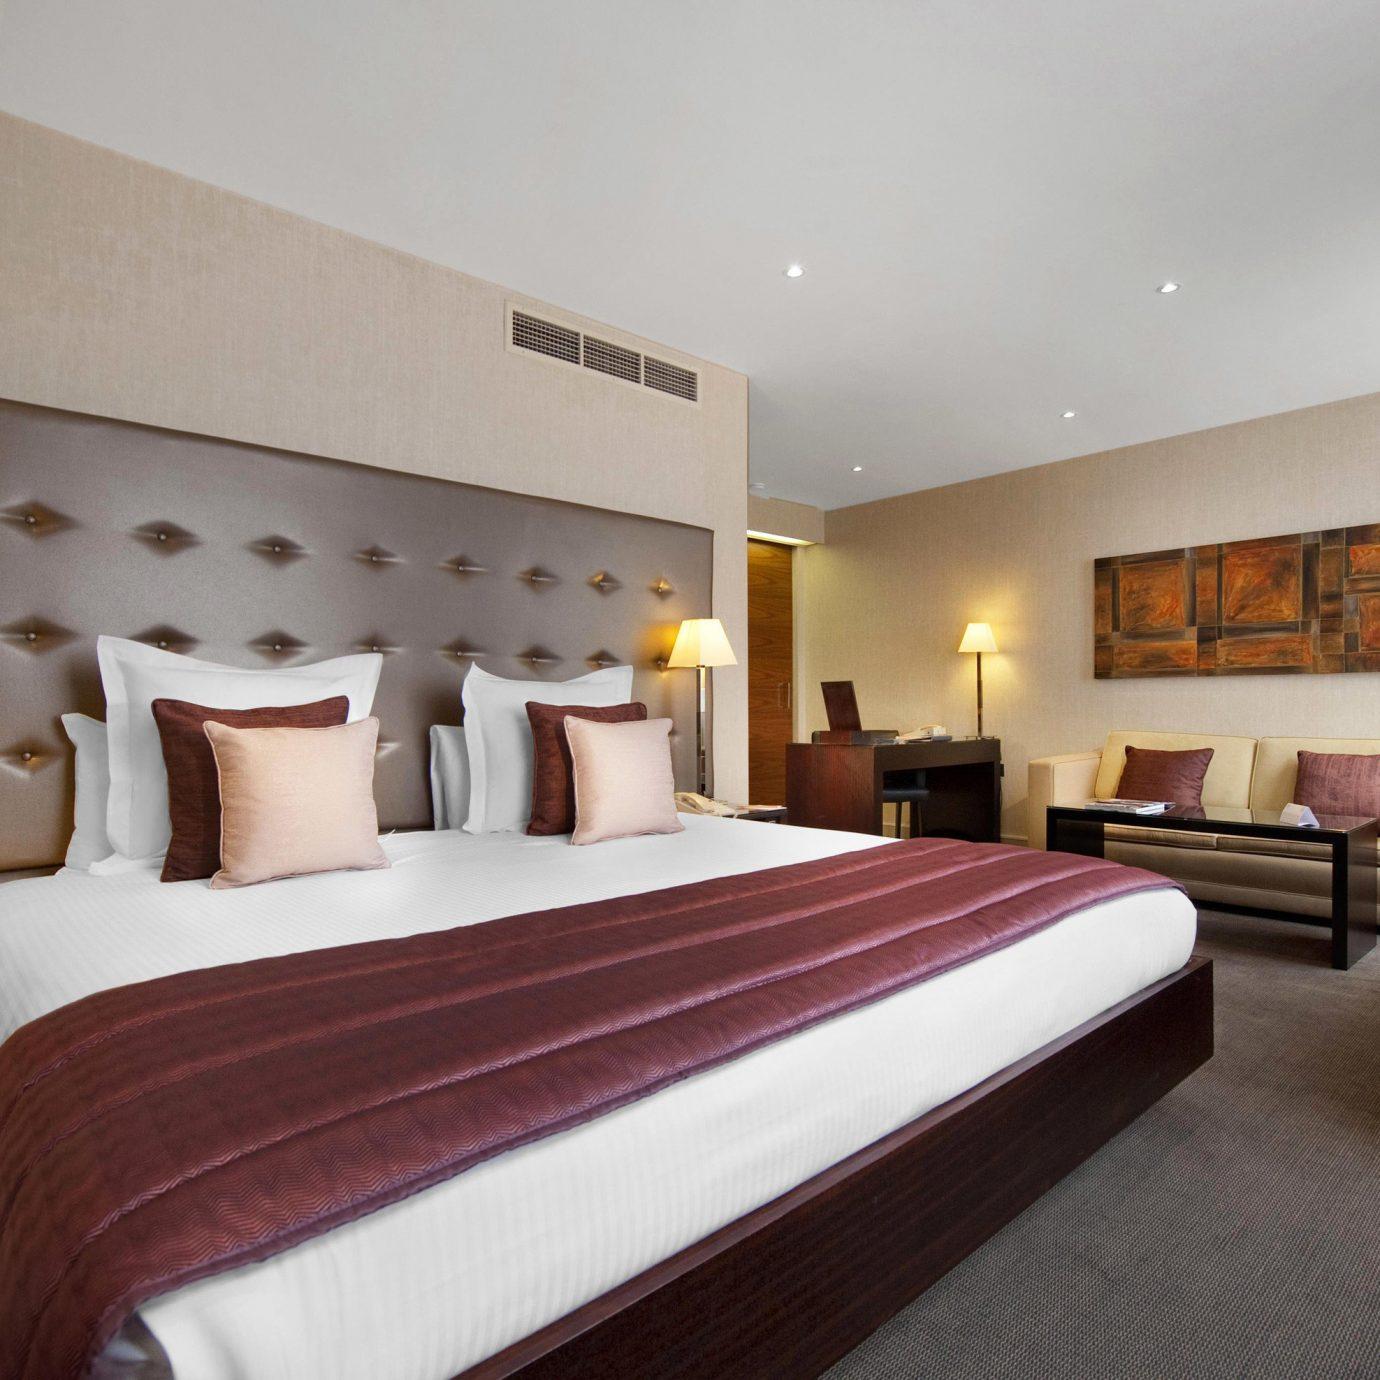 sofa Bedroom property Suite Resort Villa lamp flat